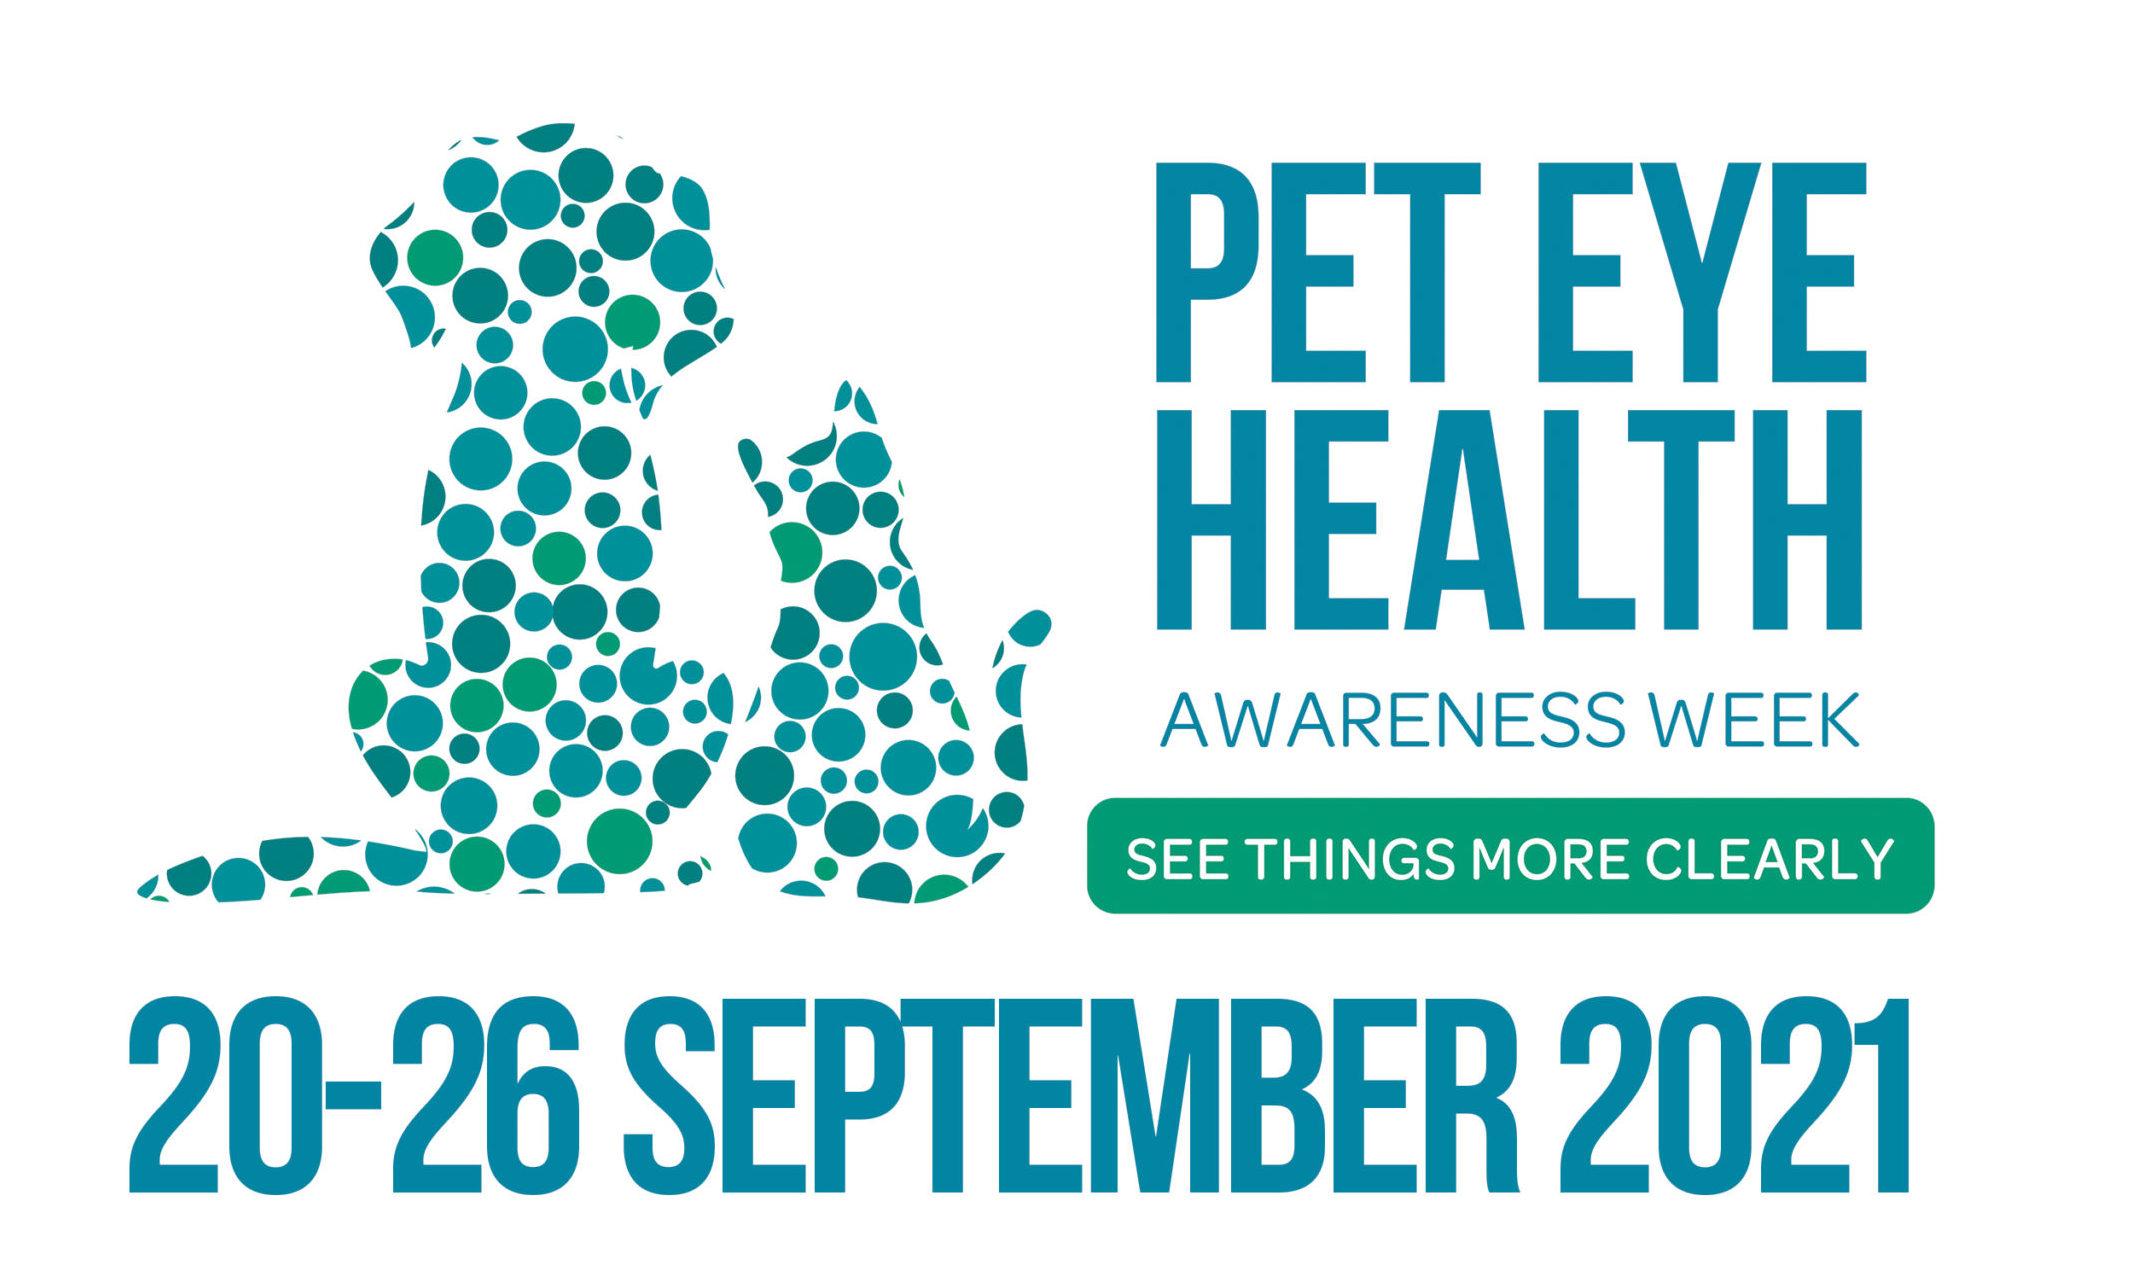 Pet Eye Health Awareness Week by TVM UK